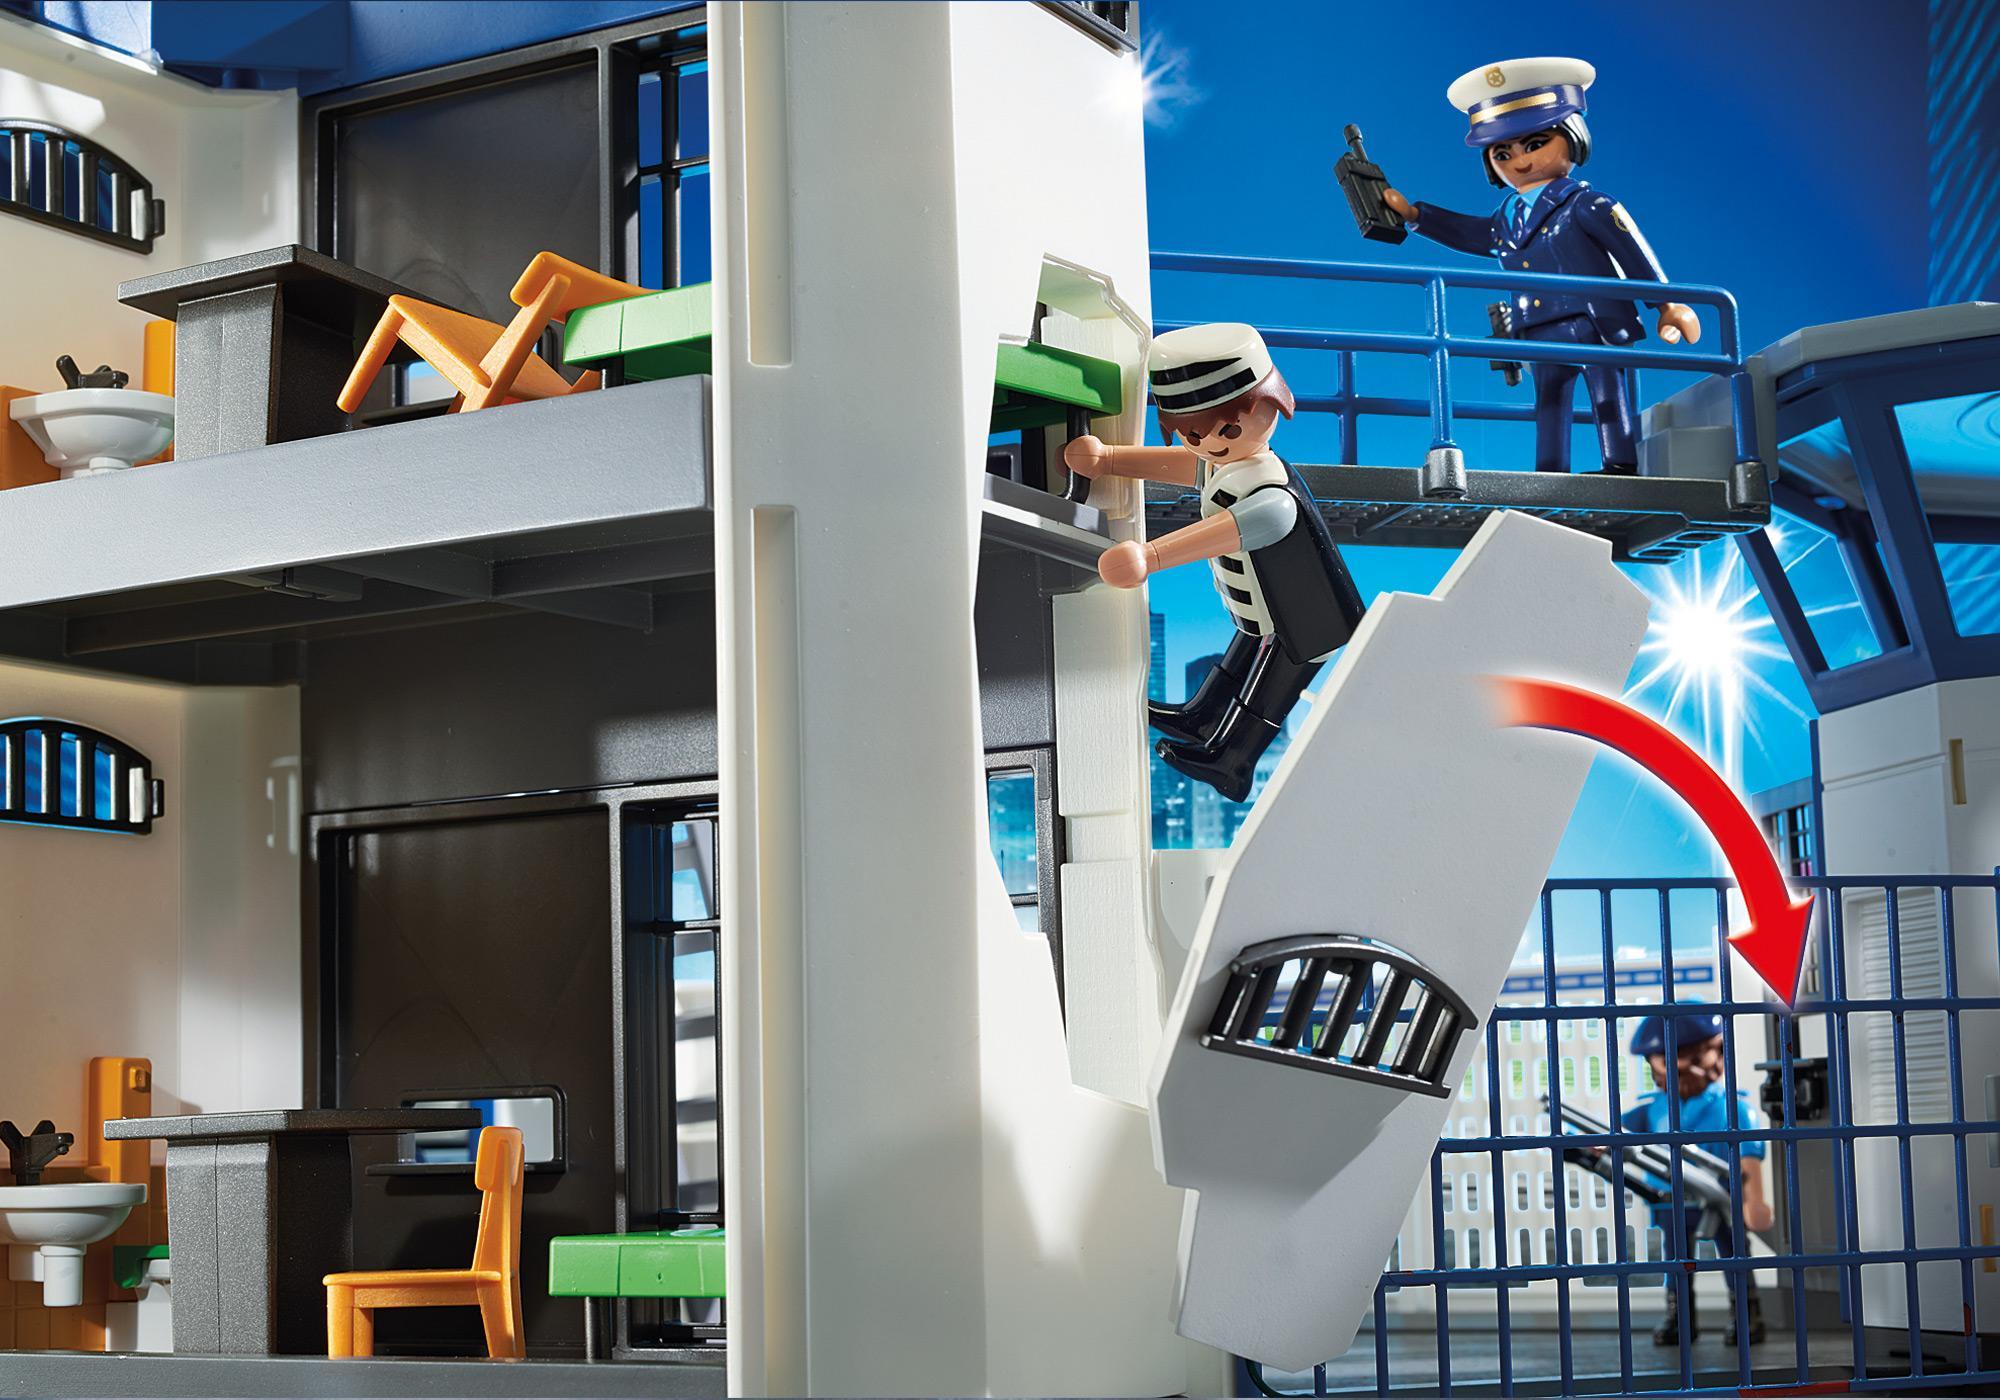 http://media.playmobil.com/i/playmobil/6919_product_extra1/Int. Polizei-Kommandozentrale mit Gefängnis